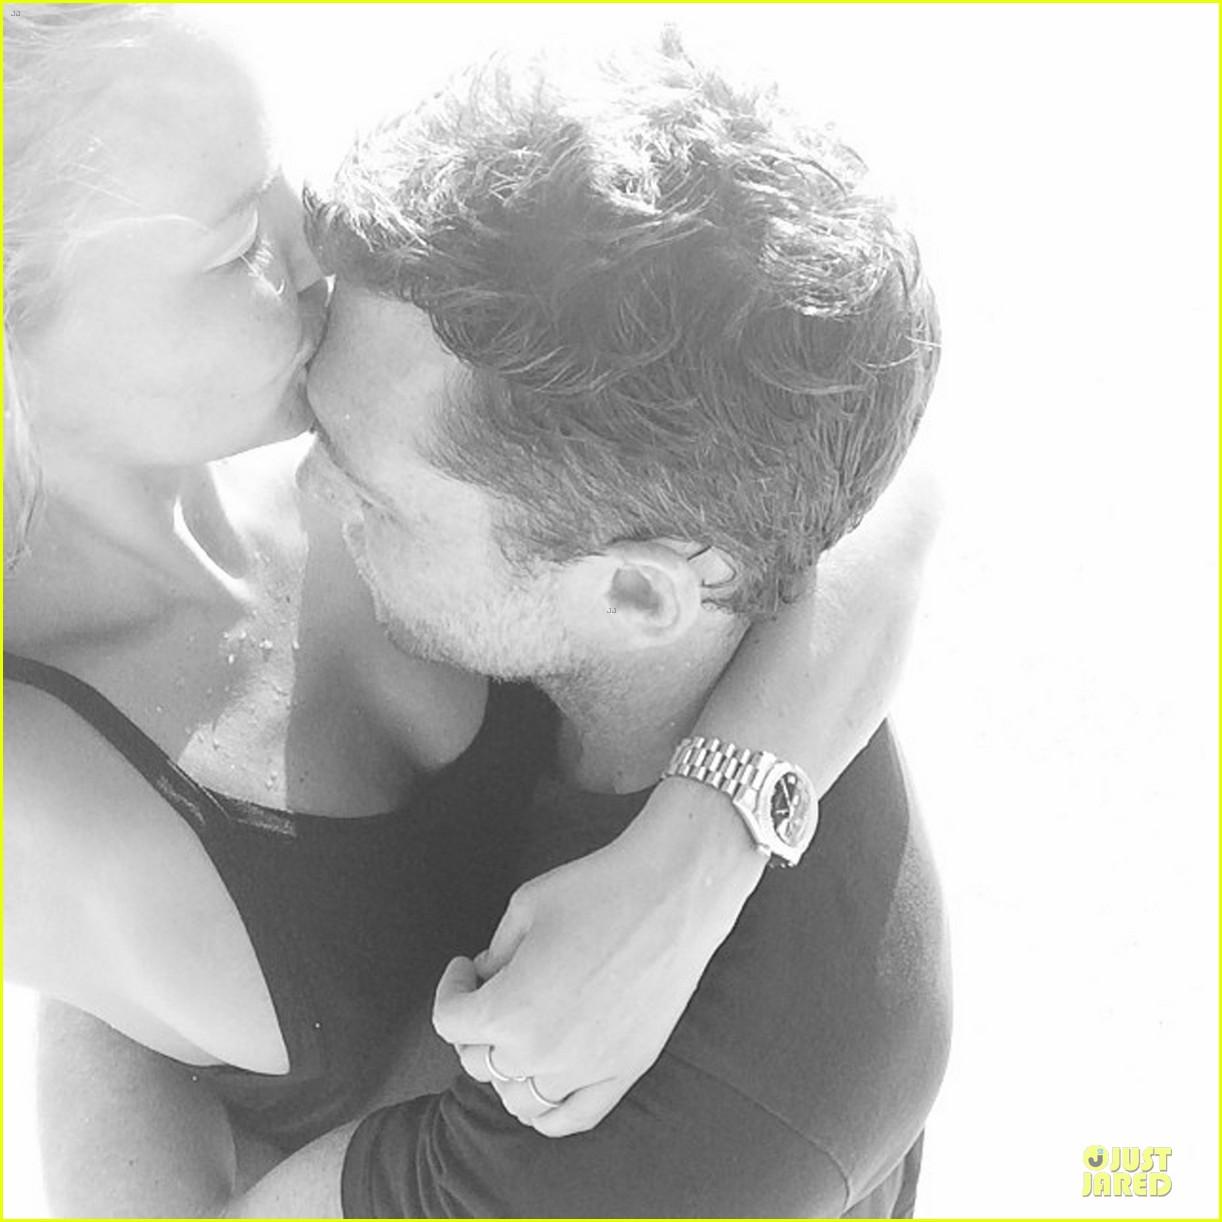 lara bingle shares steamy pic with sam worthington on valentines day 043053845